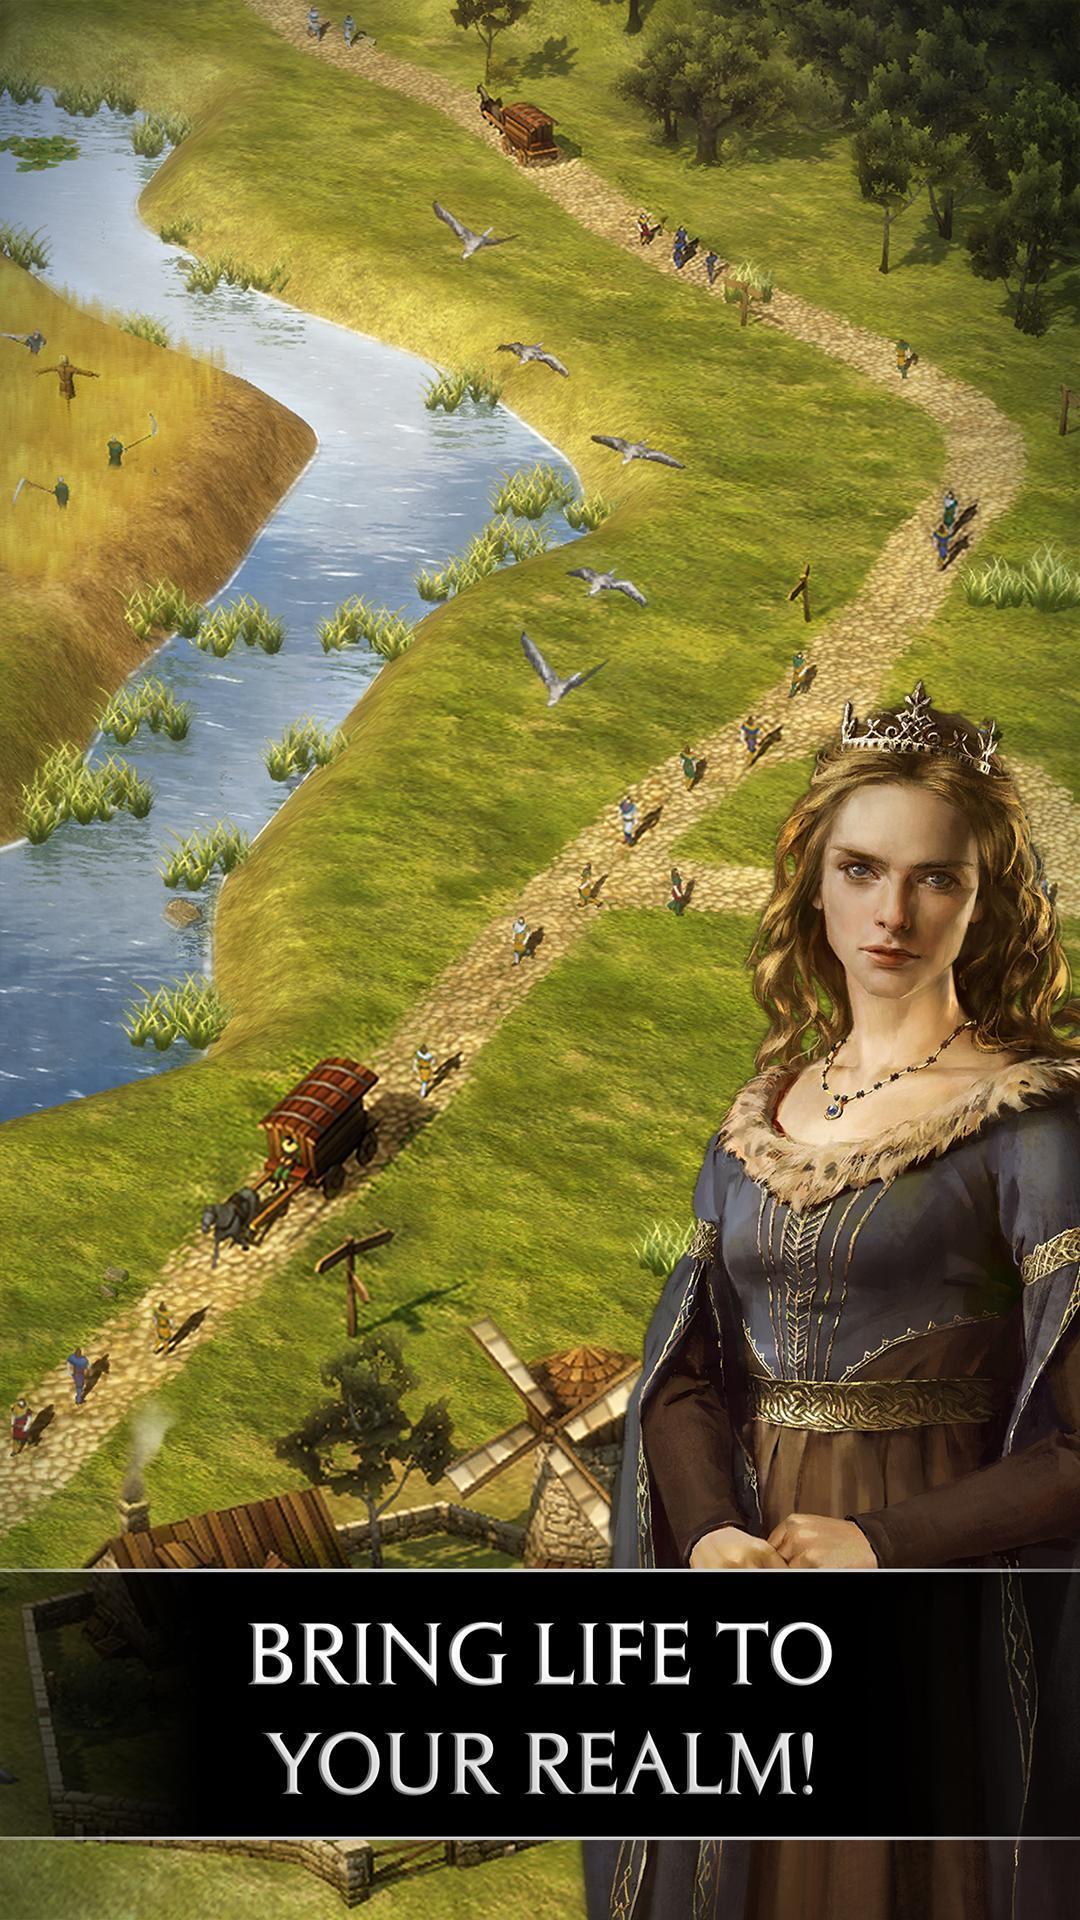 Total War Battles: KINGDOM - Strategy RPG 1.30 Screenshot 3